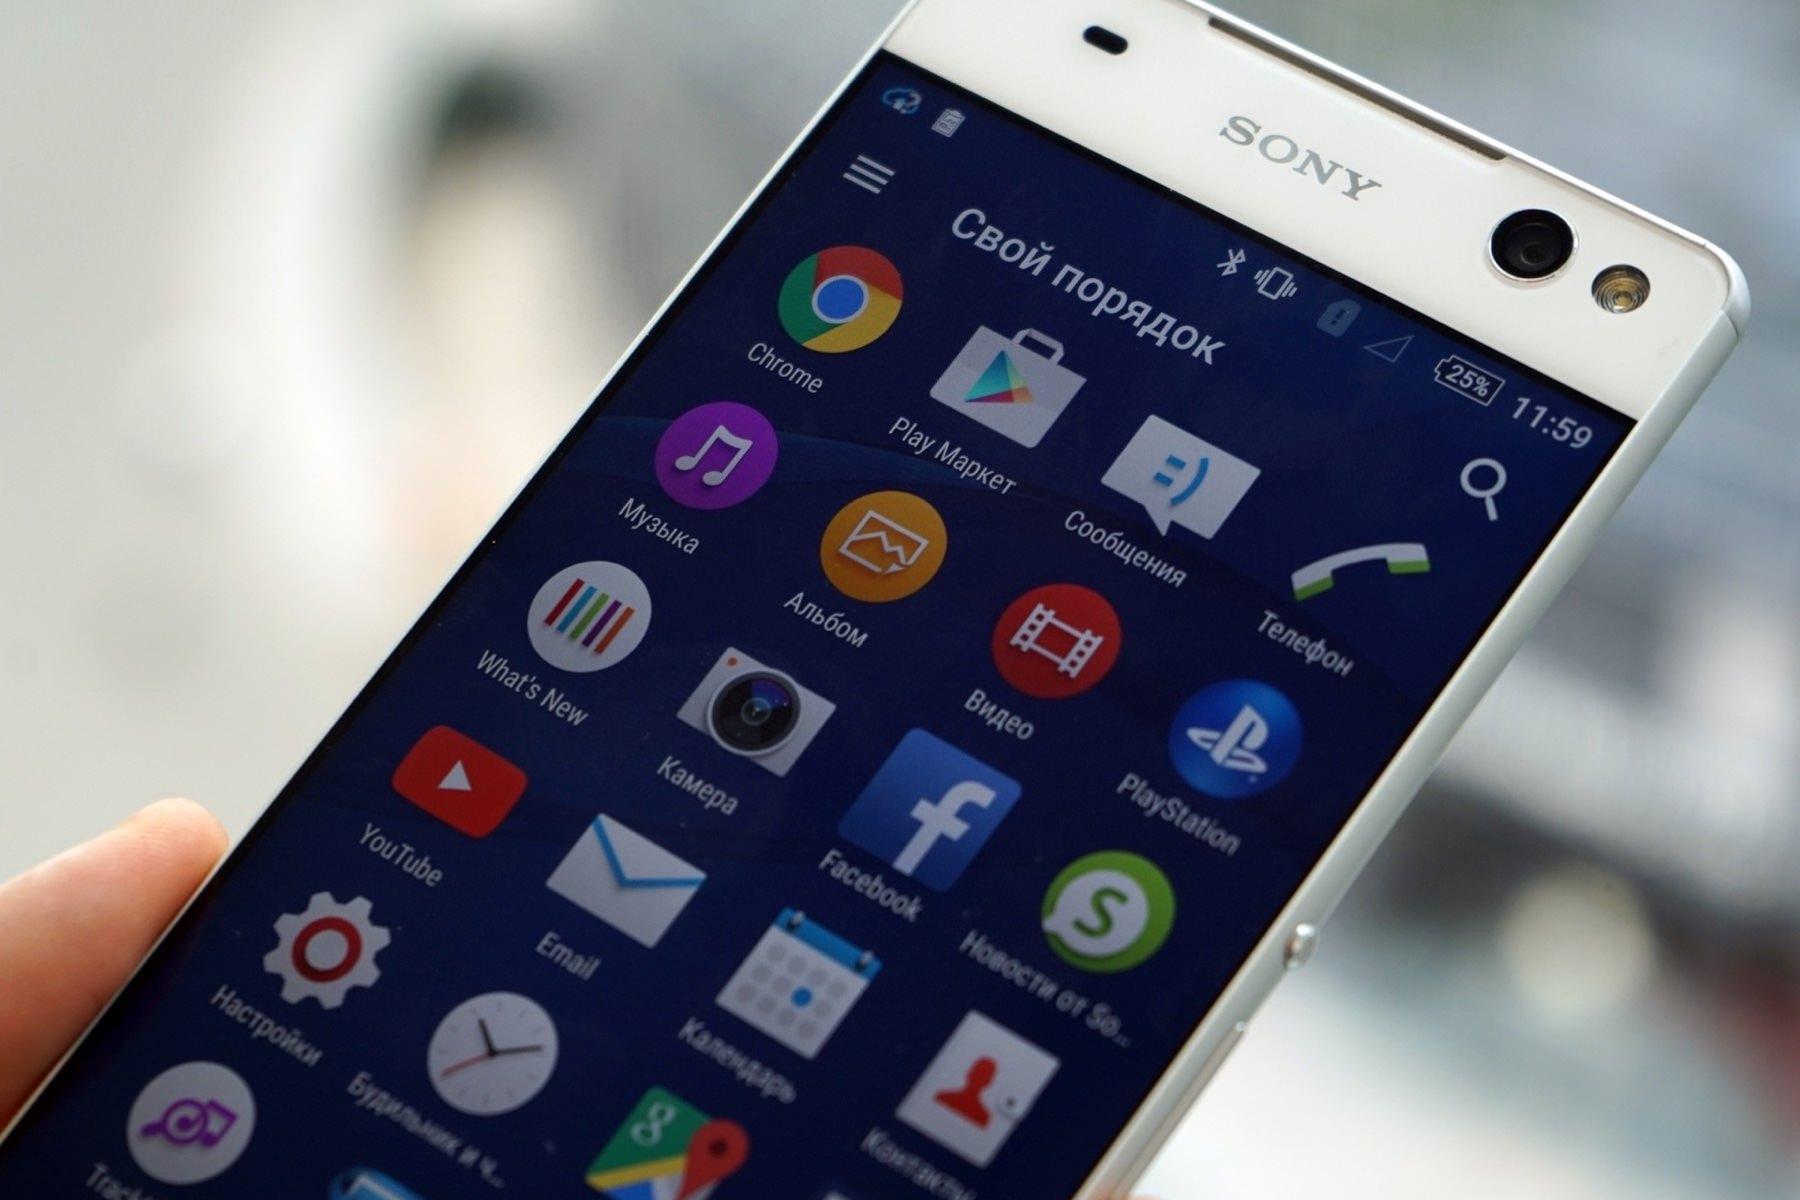 В сети появился рендер смартфона Sony Xperia C6